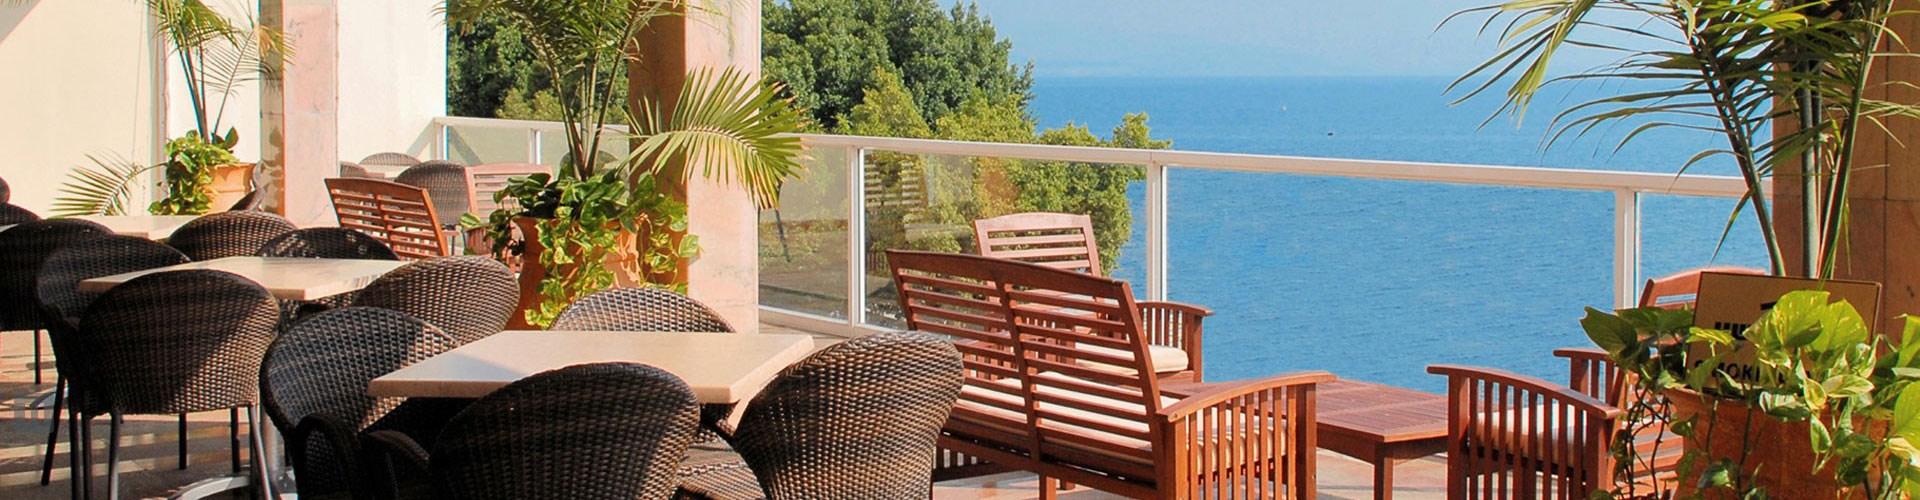 Caesar Premier Hotels - balcony